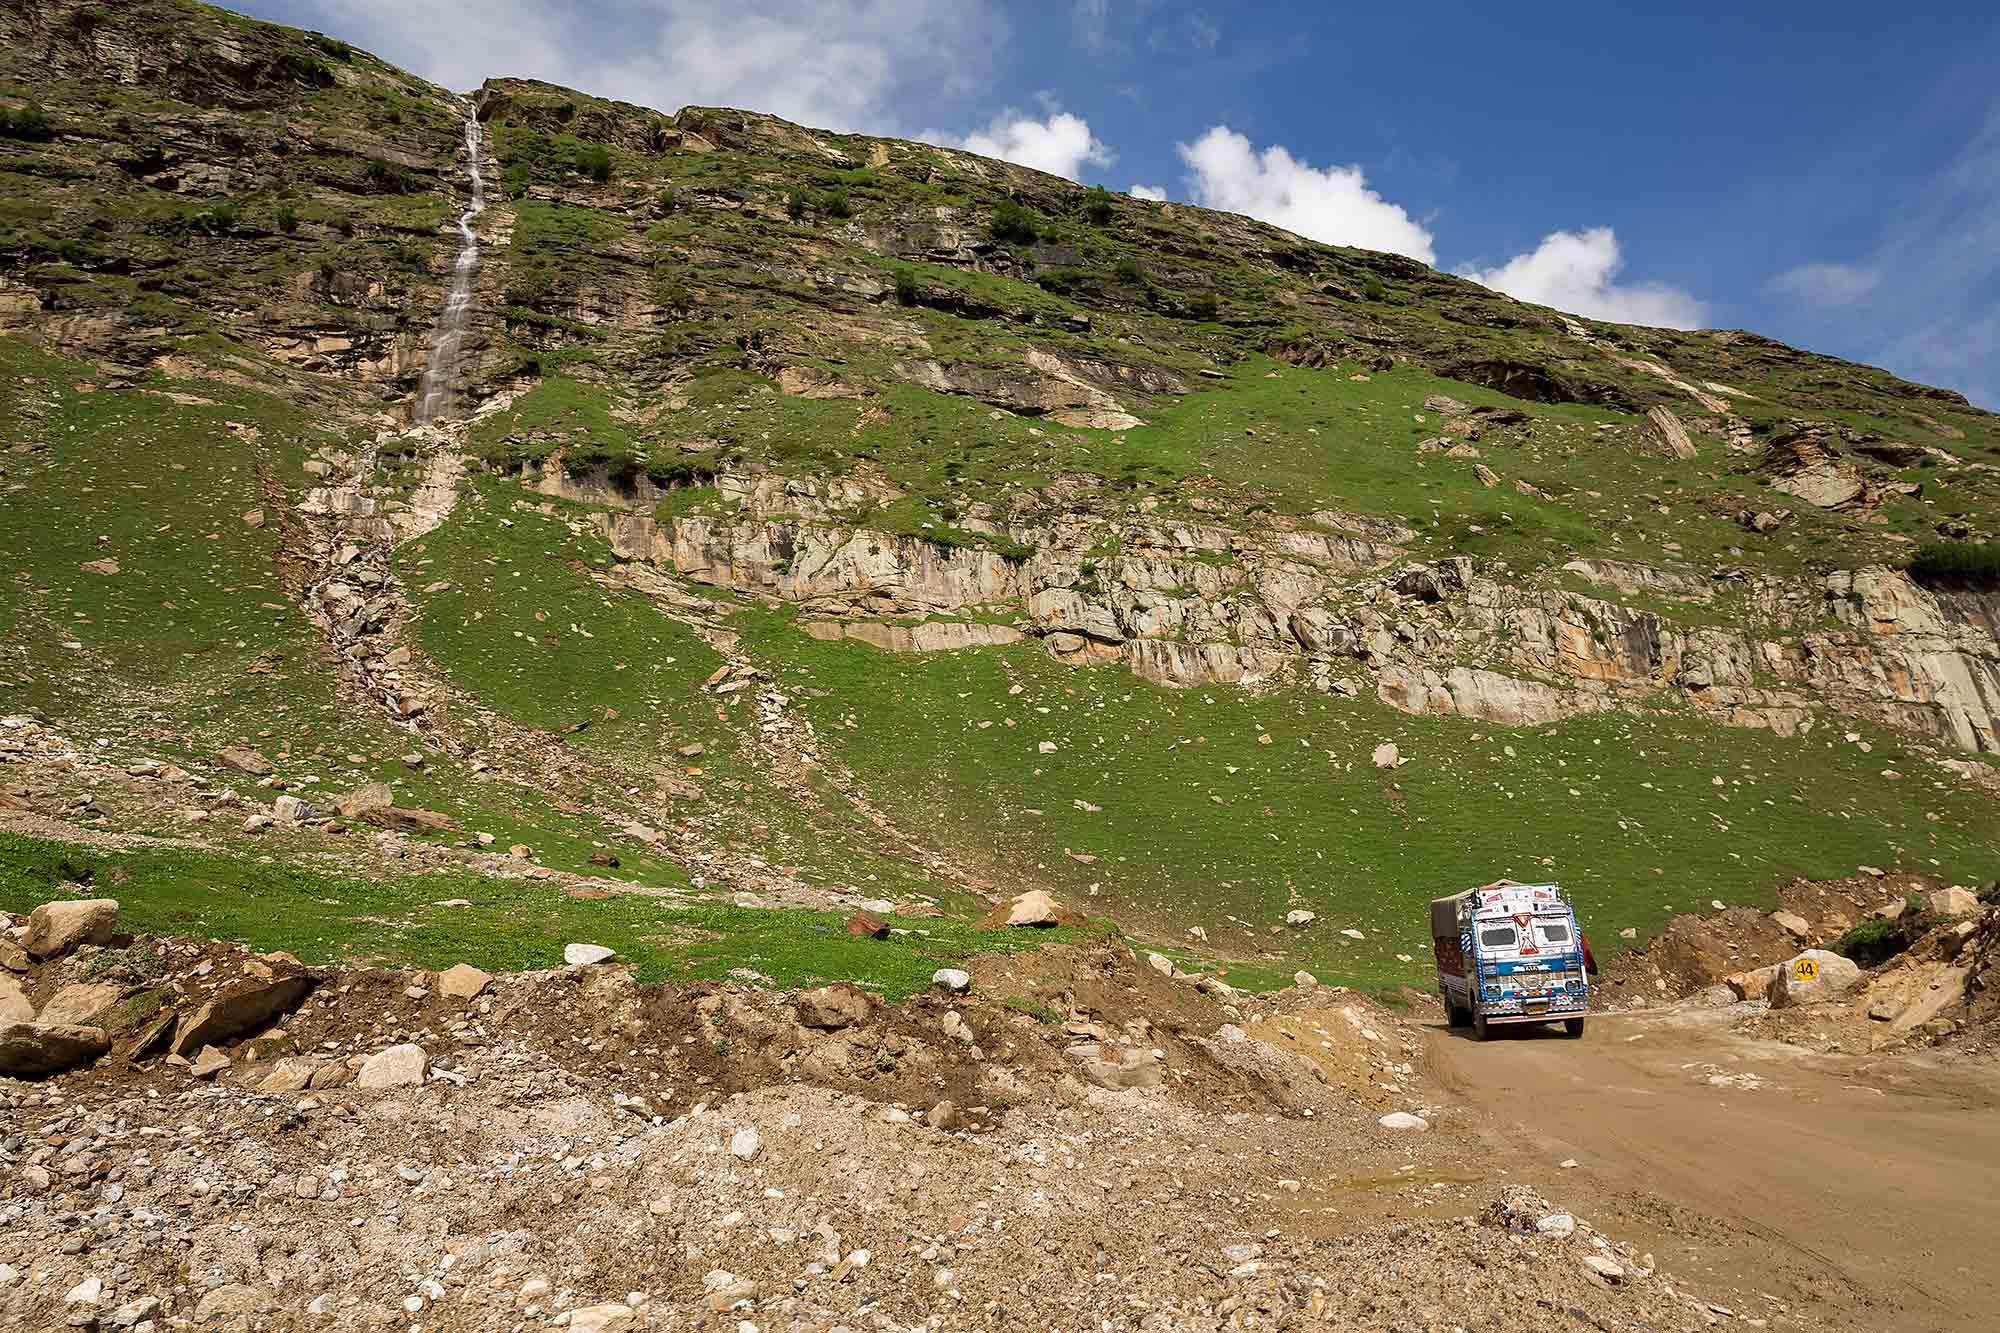 truck-leh-manali-highway-rothang-pass-kashmir-ladakh-india